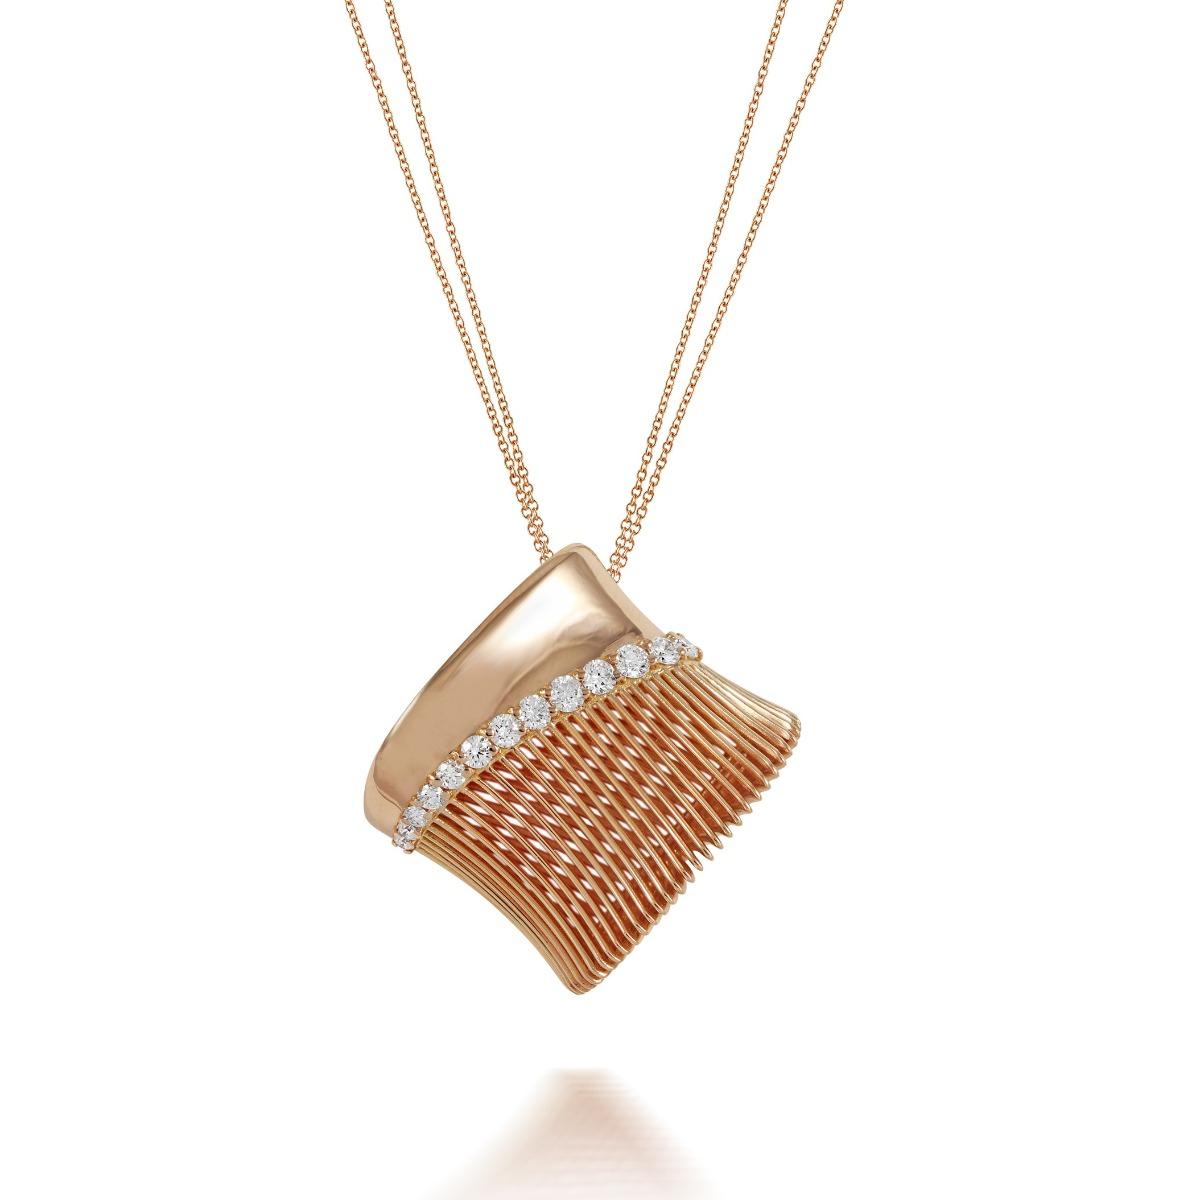 Batumi Rose Gold and Diamond Necklace